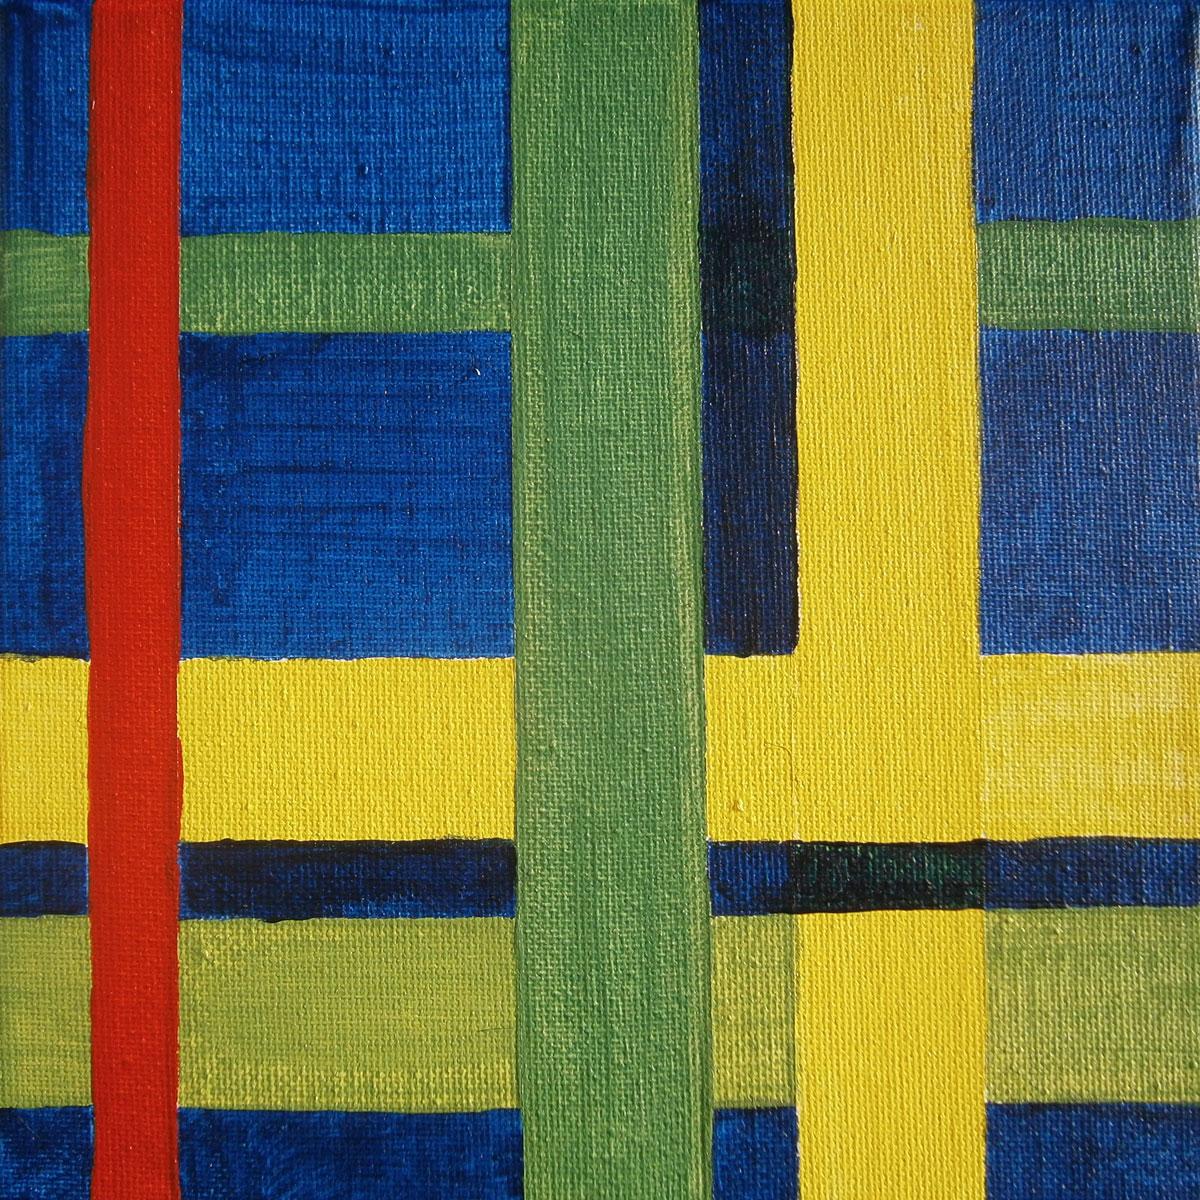 Komposition mit Rot, Nr. 1, Acryl auf Leinwand, 20 x 20 cm